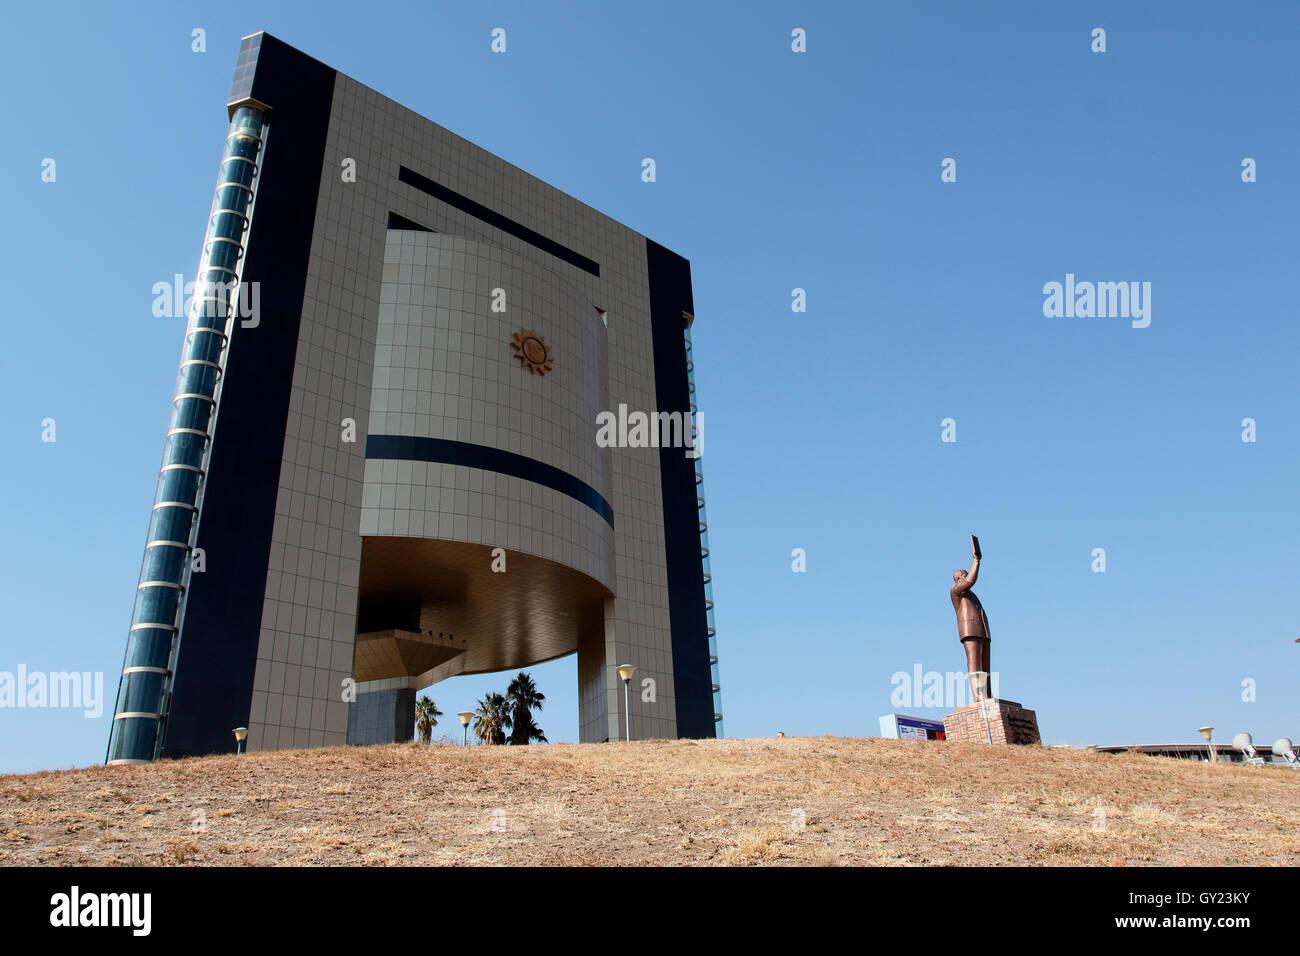 Independence memorial museum, Windhoek, Namibia, August 2016 - Stock Image